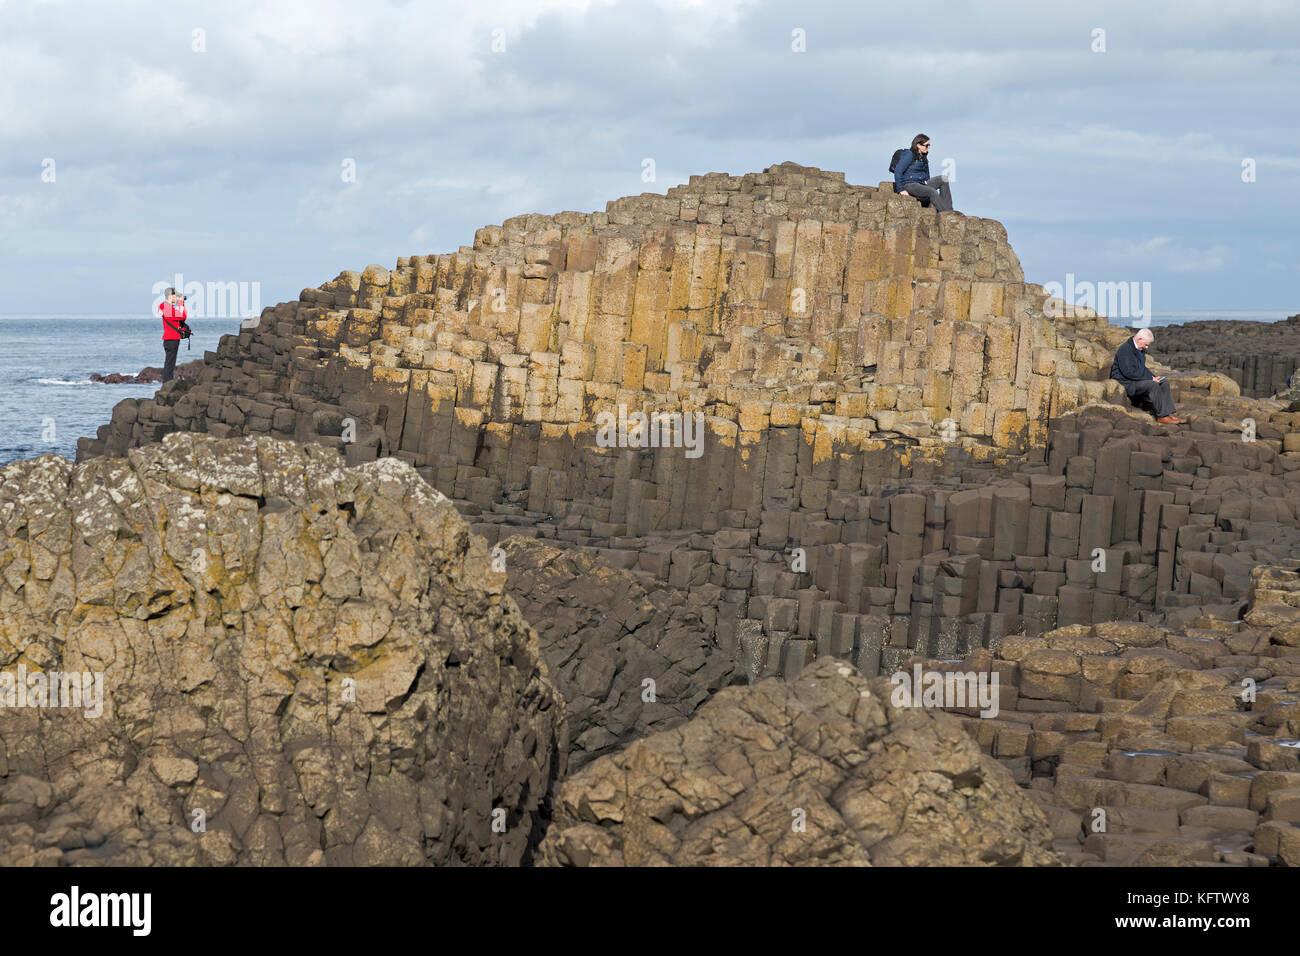 basaltic columns, Giants Causeway, Bushmills, Co. Antrim, Northern Ireland - Stock Image